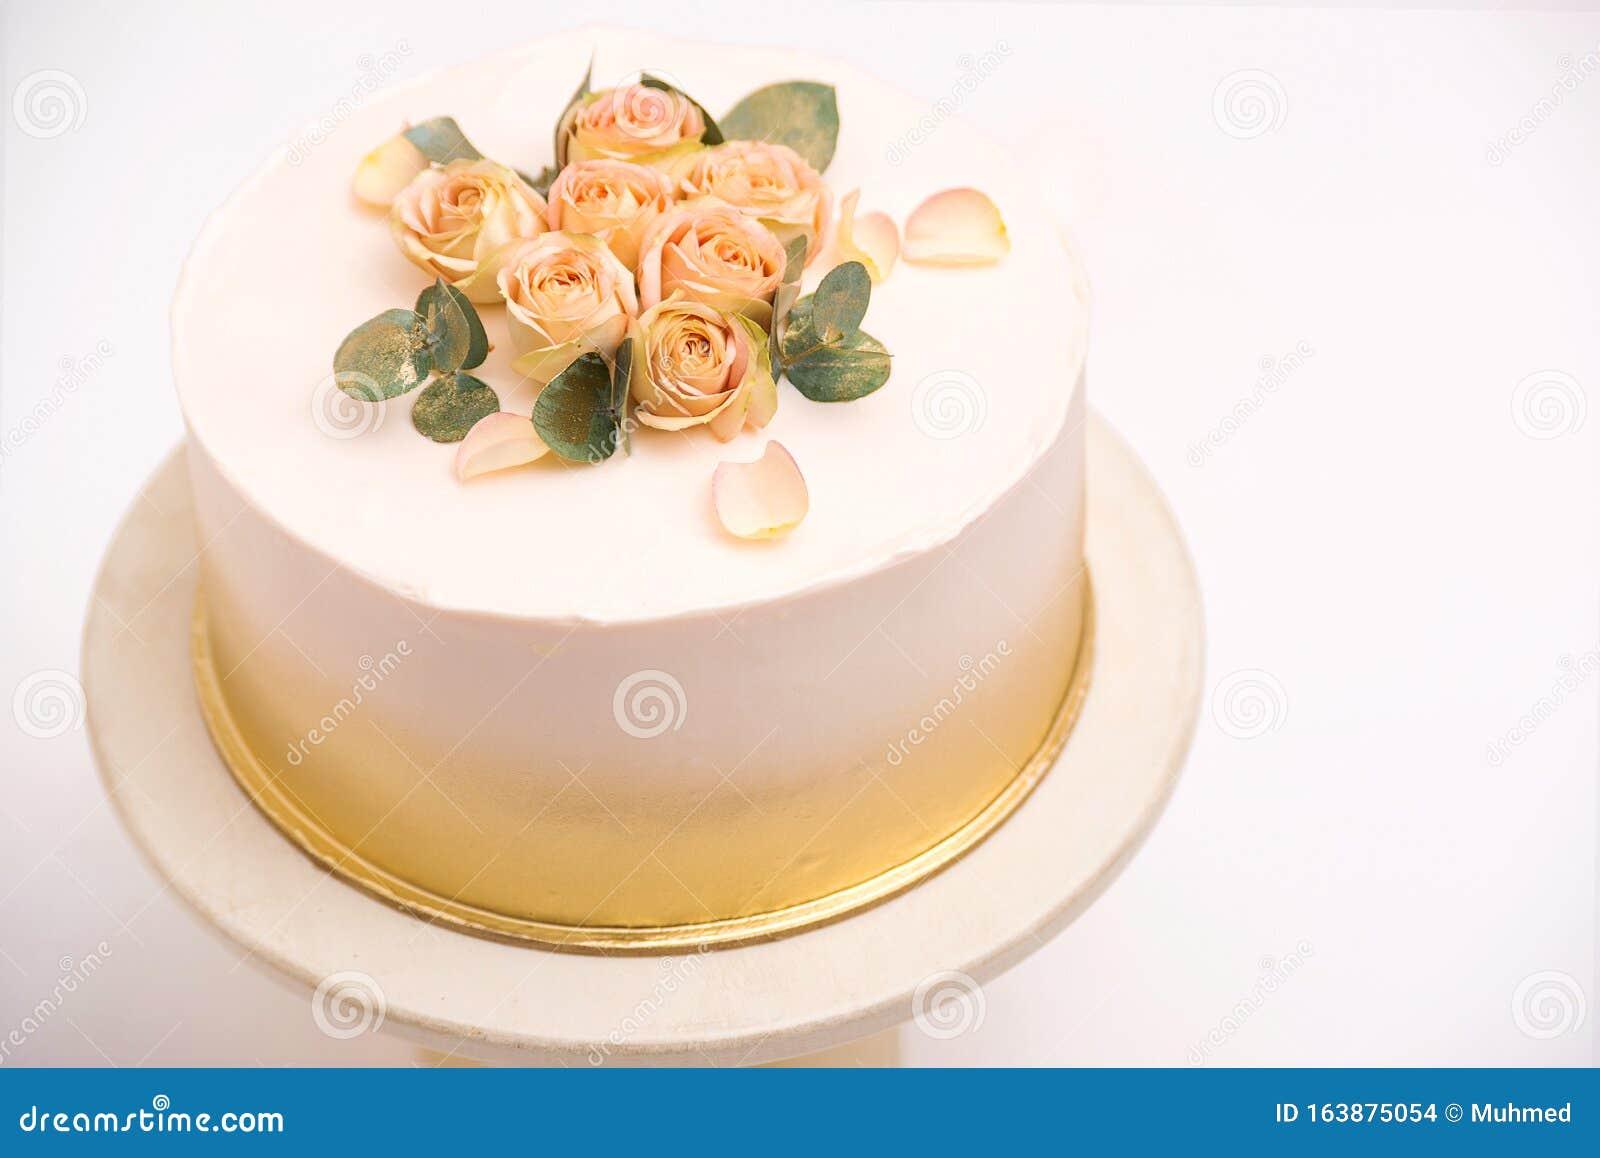 Admirable Elegant Wedding Cake With Beautiful Roses Flowers On White Table Personalised Birthday Cards Veneteletsinfo